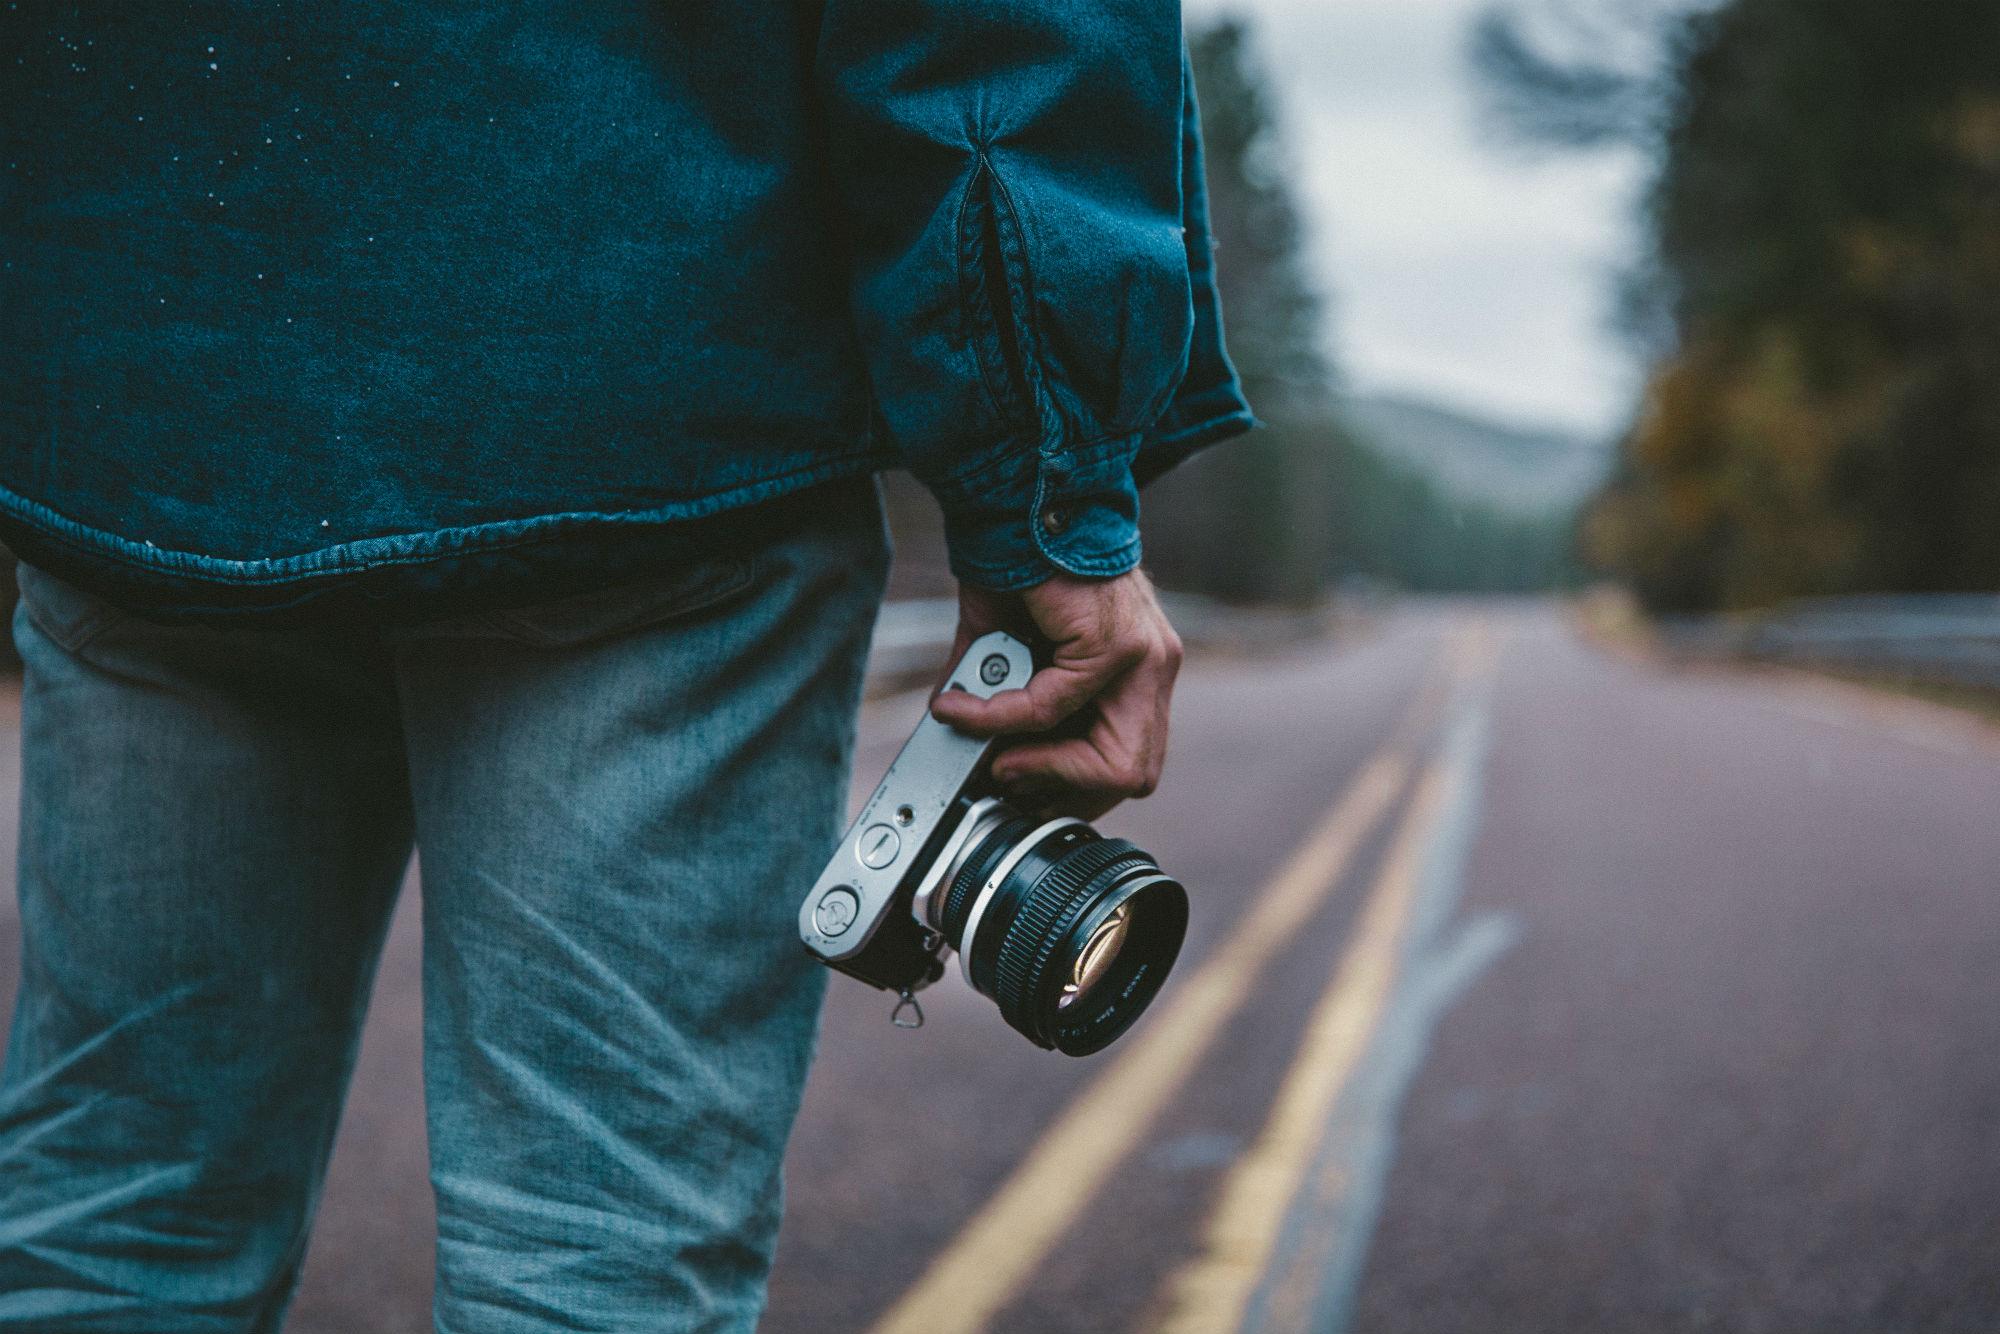 Beginner Photography Mistakes and Tricks For Avoiding Them